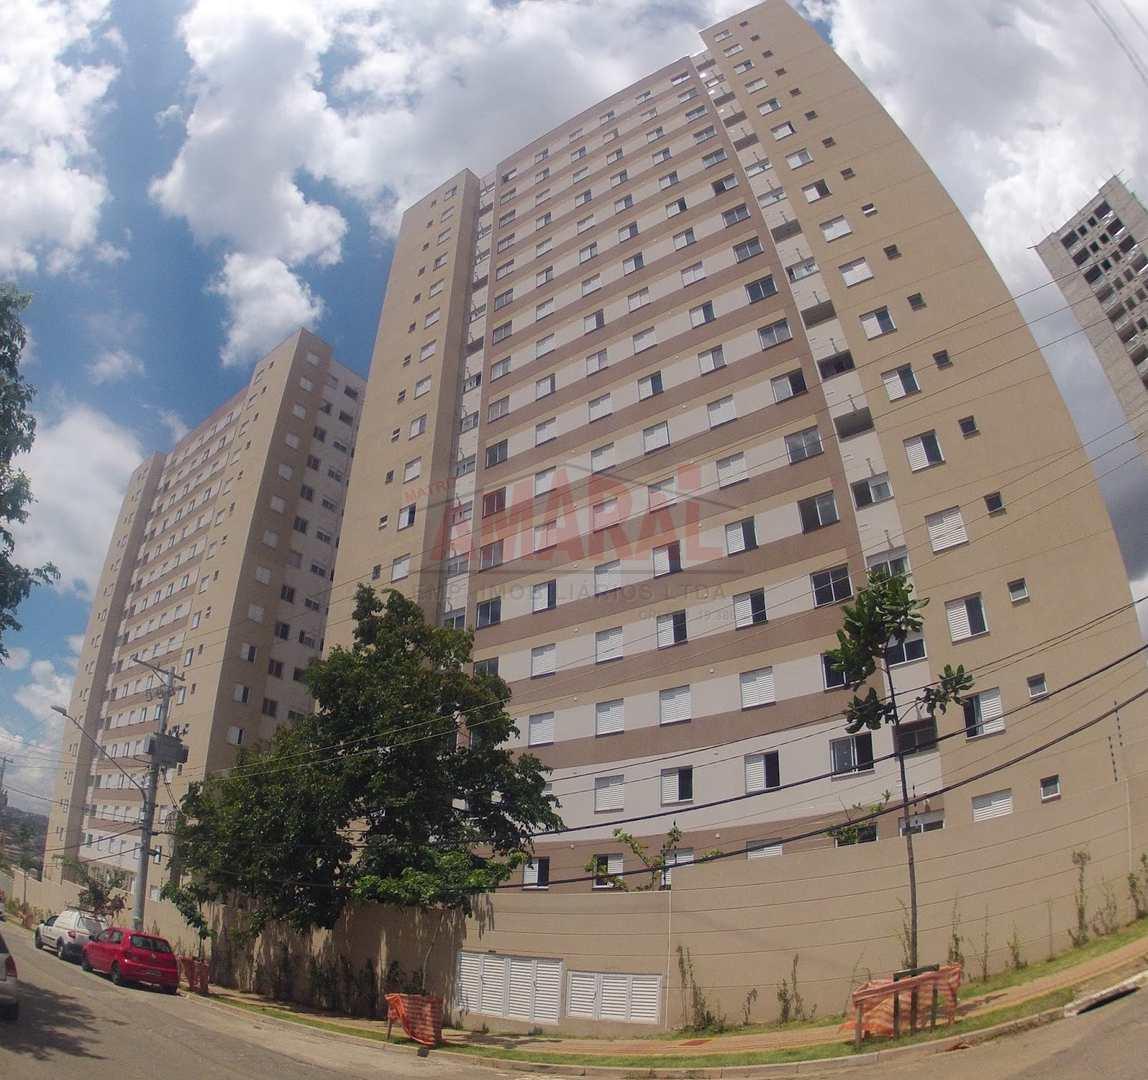 Apartamento com 2 dorms, Cidade Satélite Santa Bárbara, São Paulo - R$ 215 mil, Cod: 11264